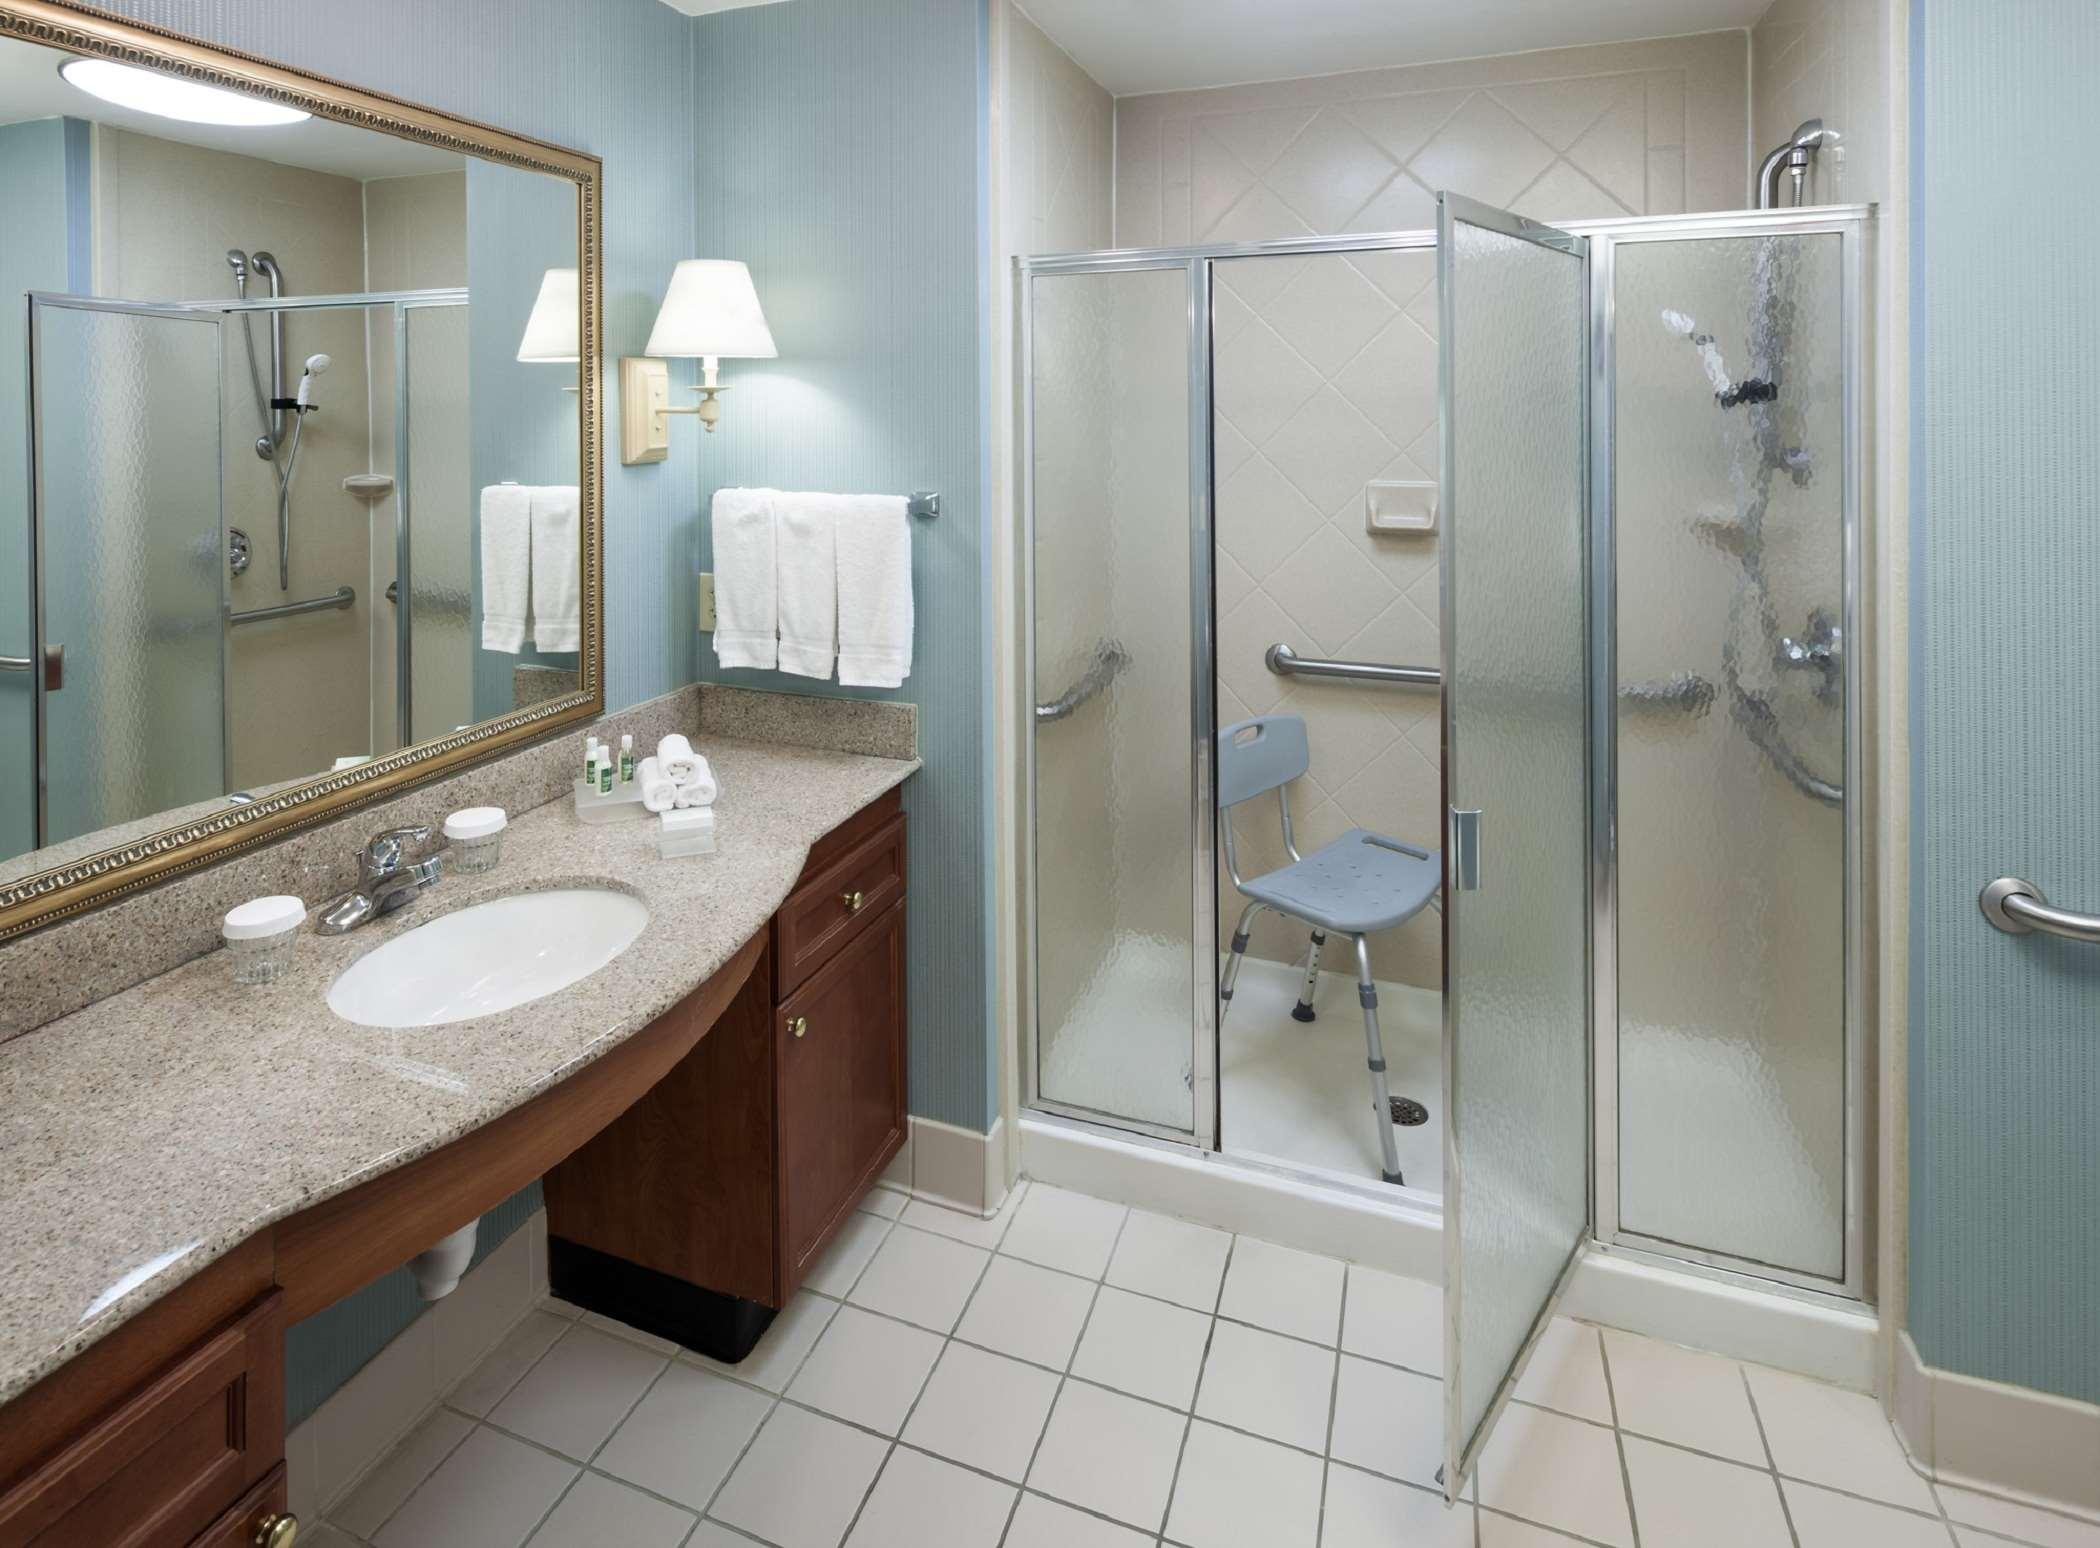 Homewood Suites by Hilton Philadelphia/Mt. Laurel image 8